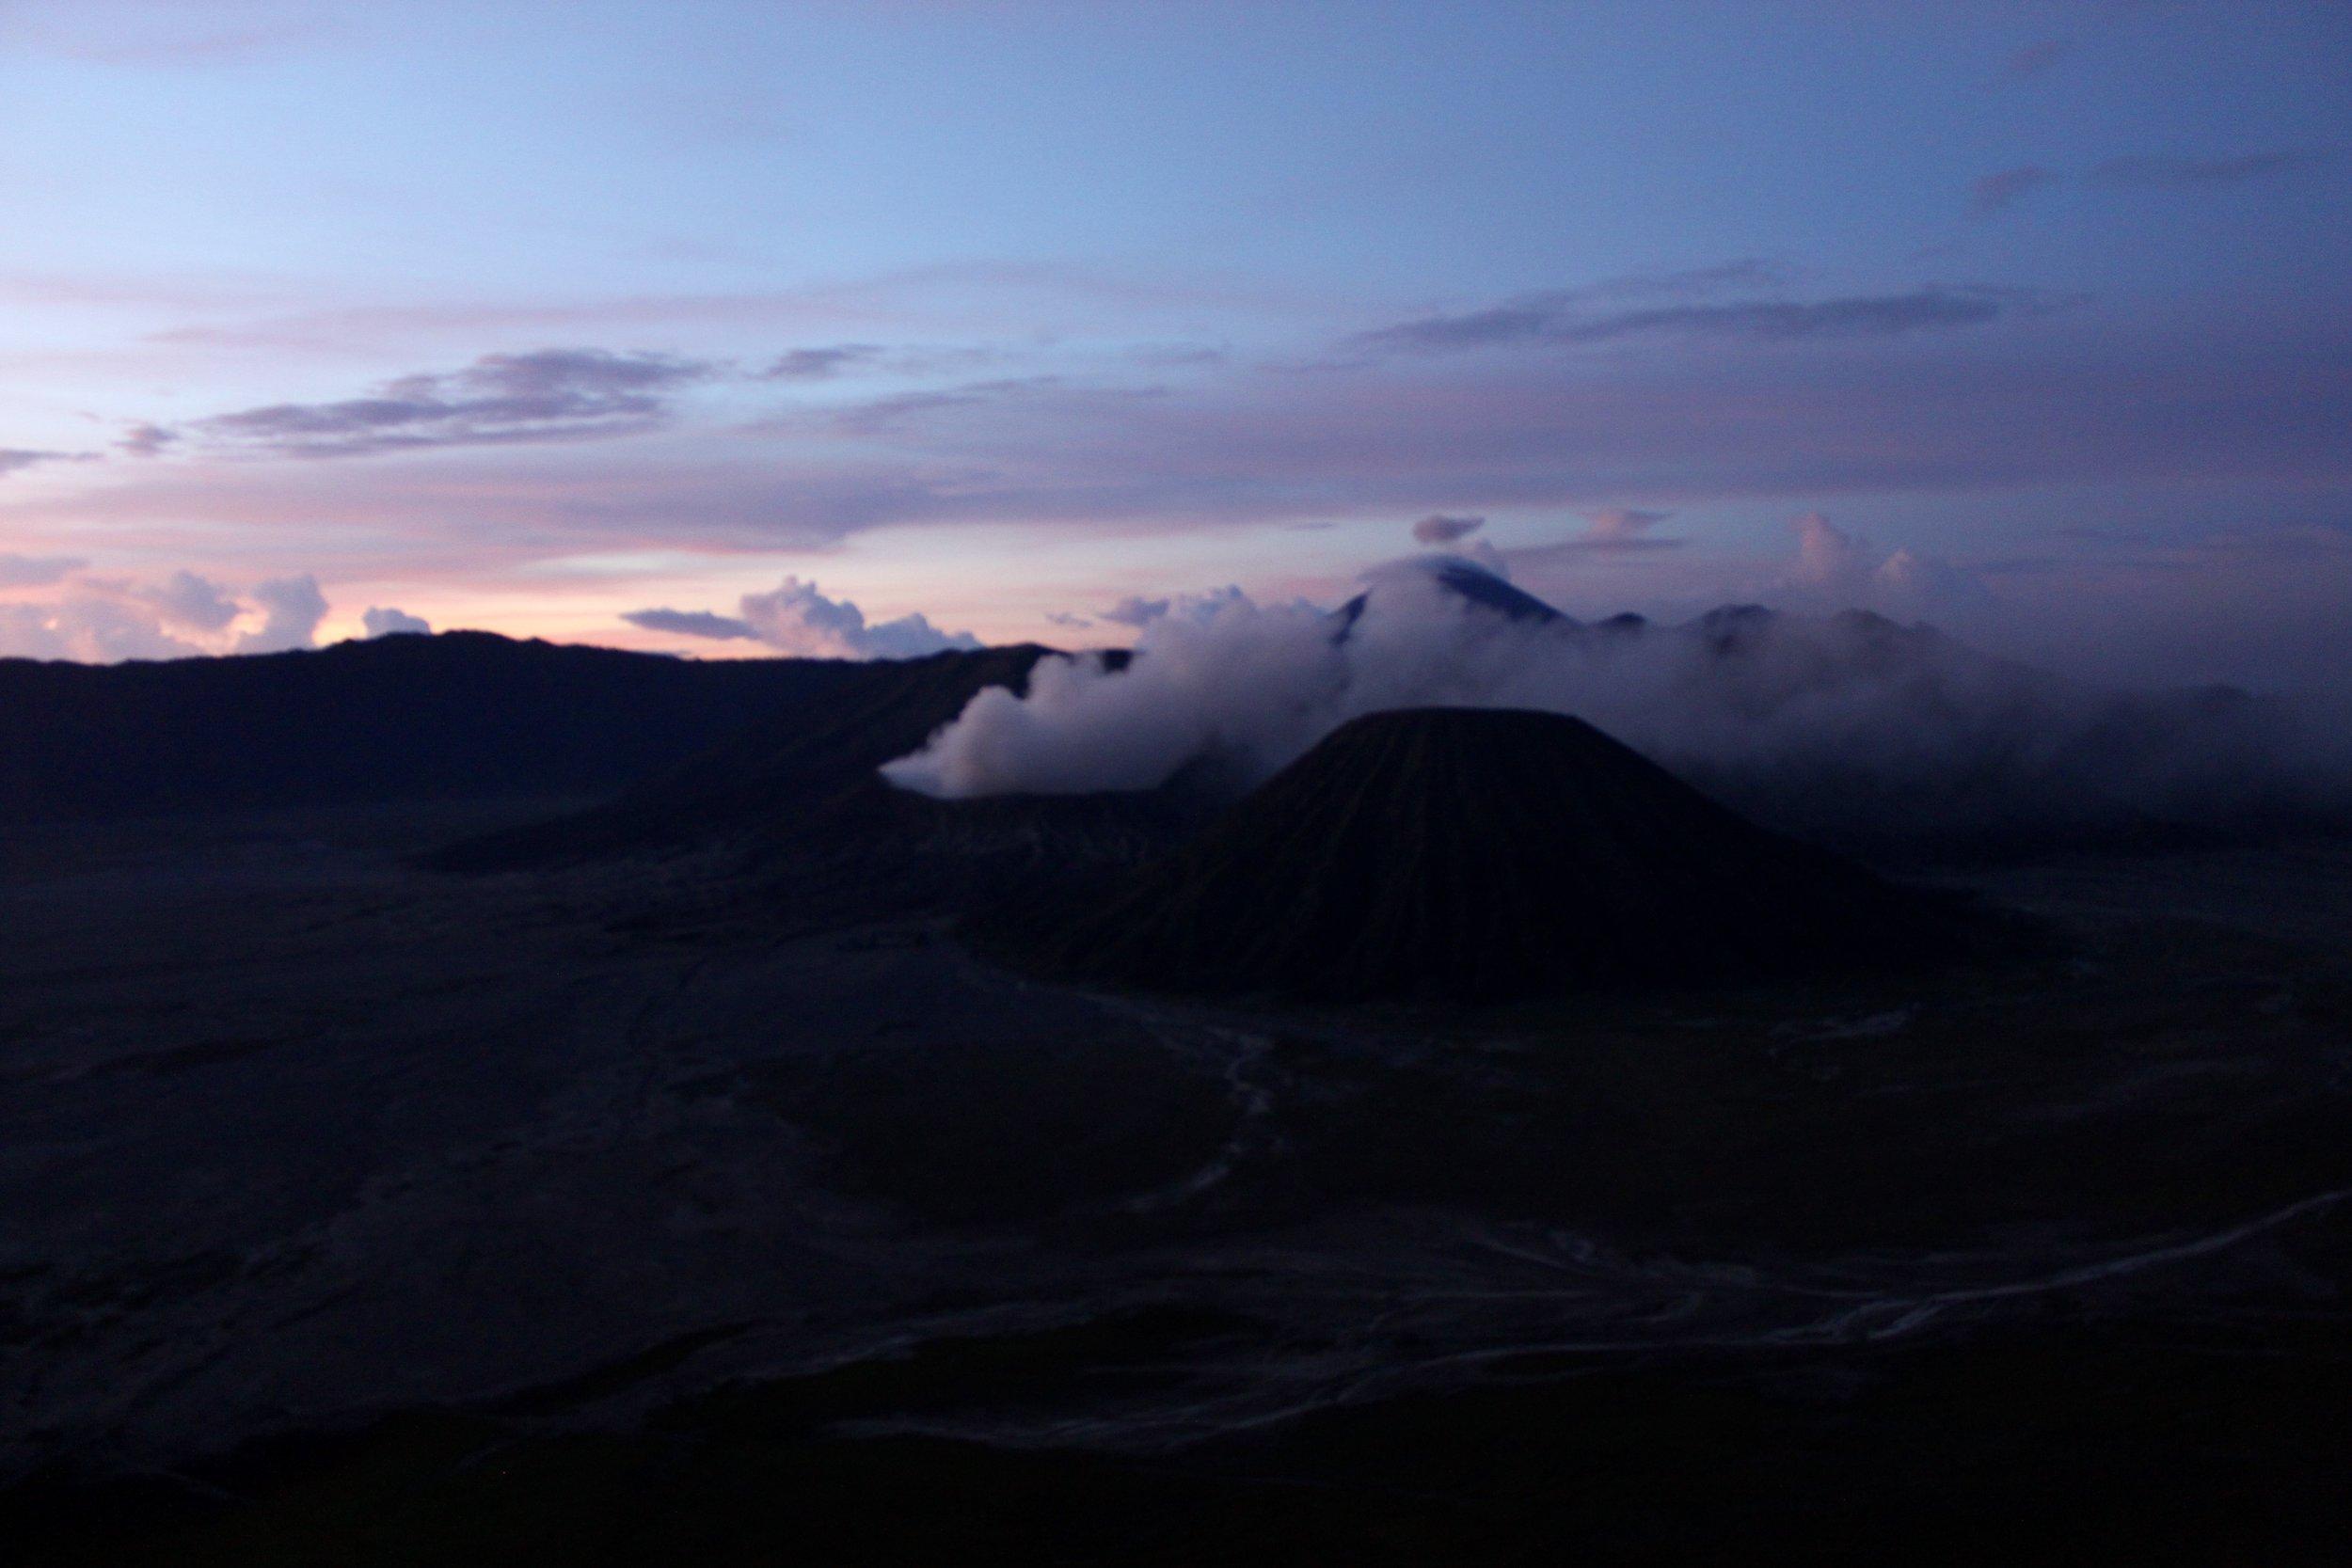 Pt 1. Sunrise Over Mt. Bromo